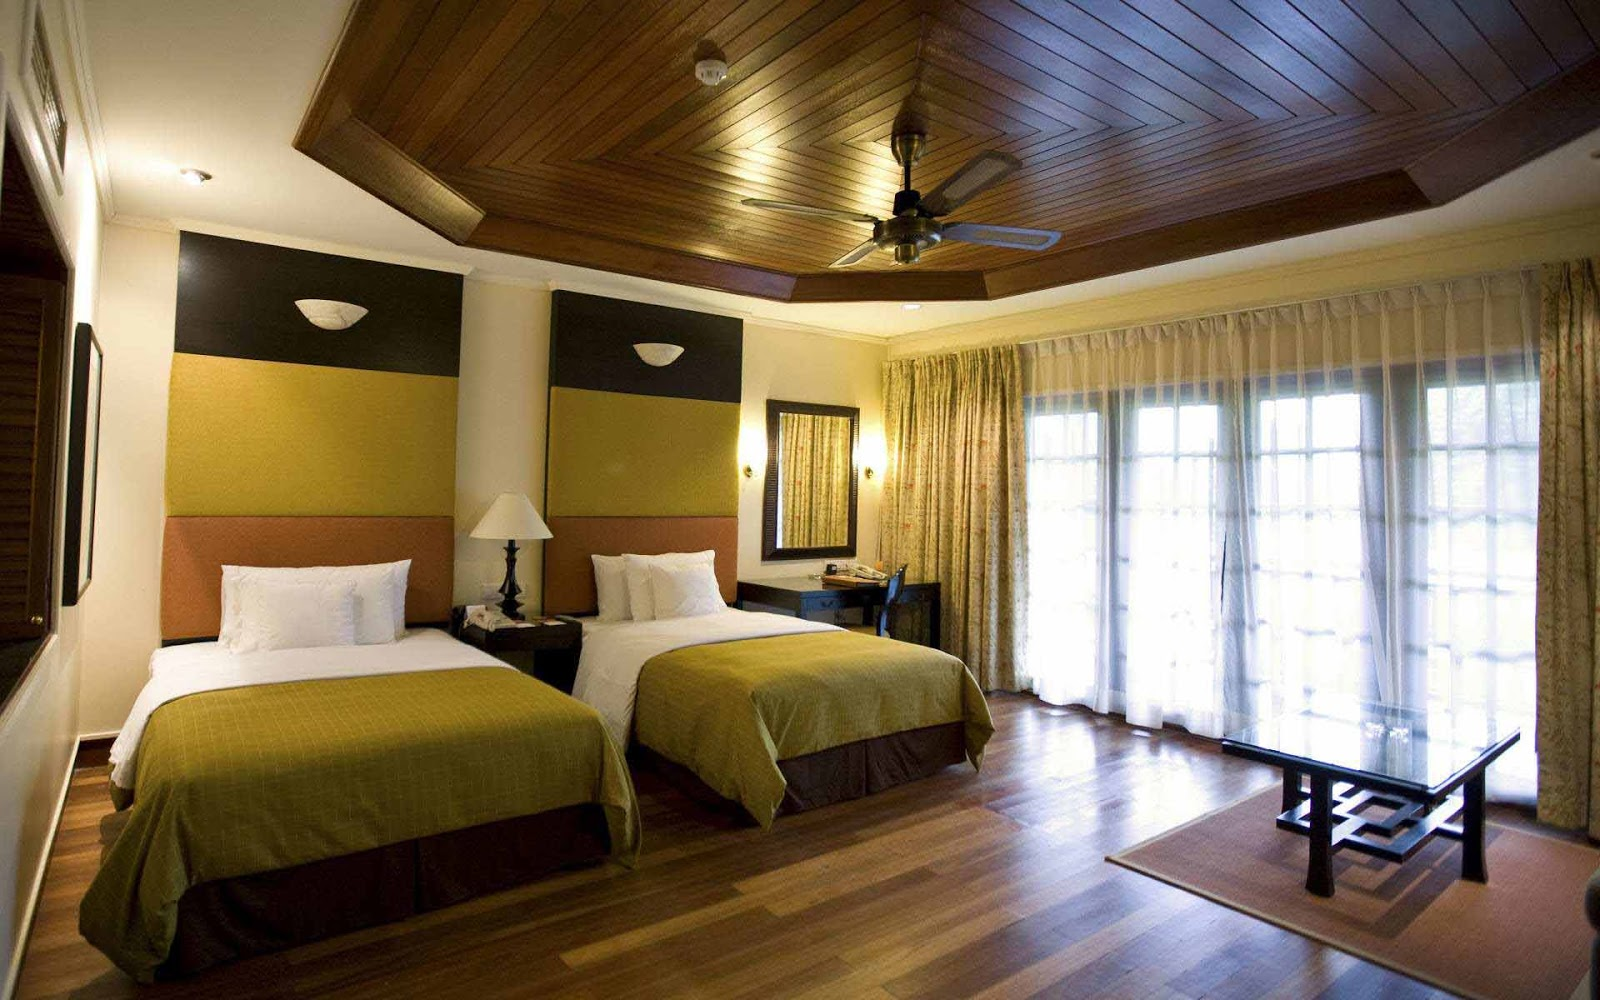 Contoh Gambar Desain Interior Apartemen 2 Kamar Tidur